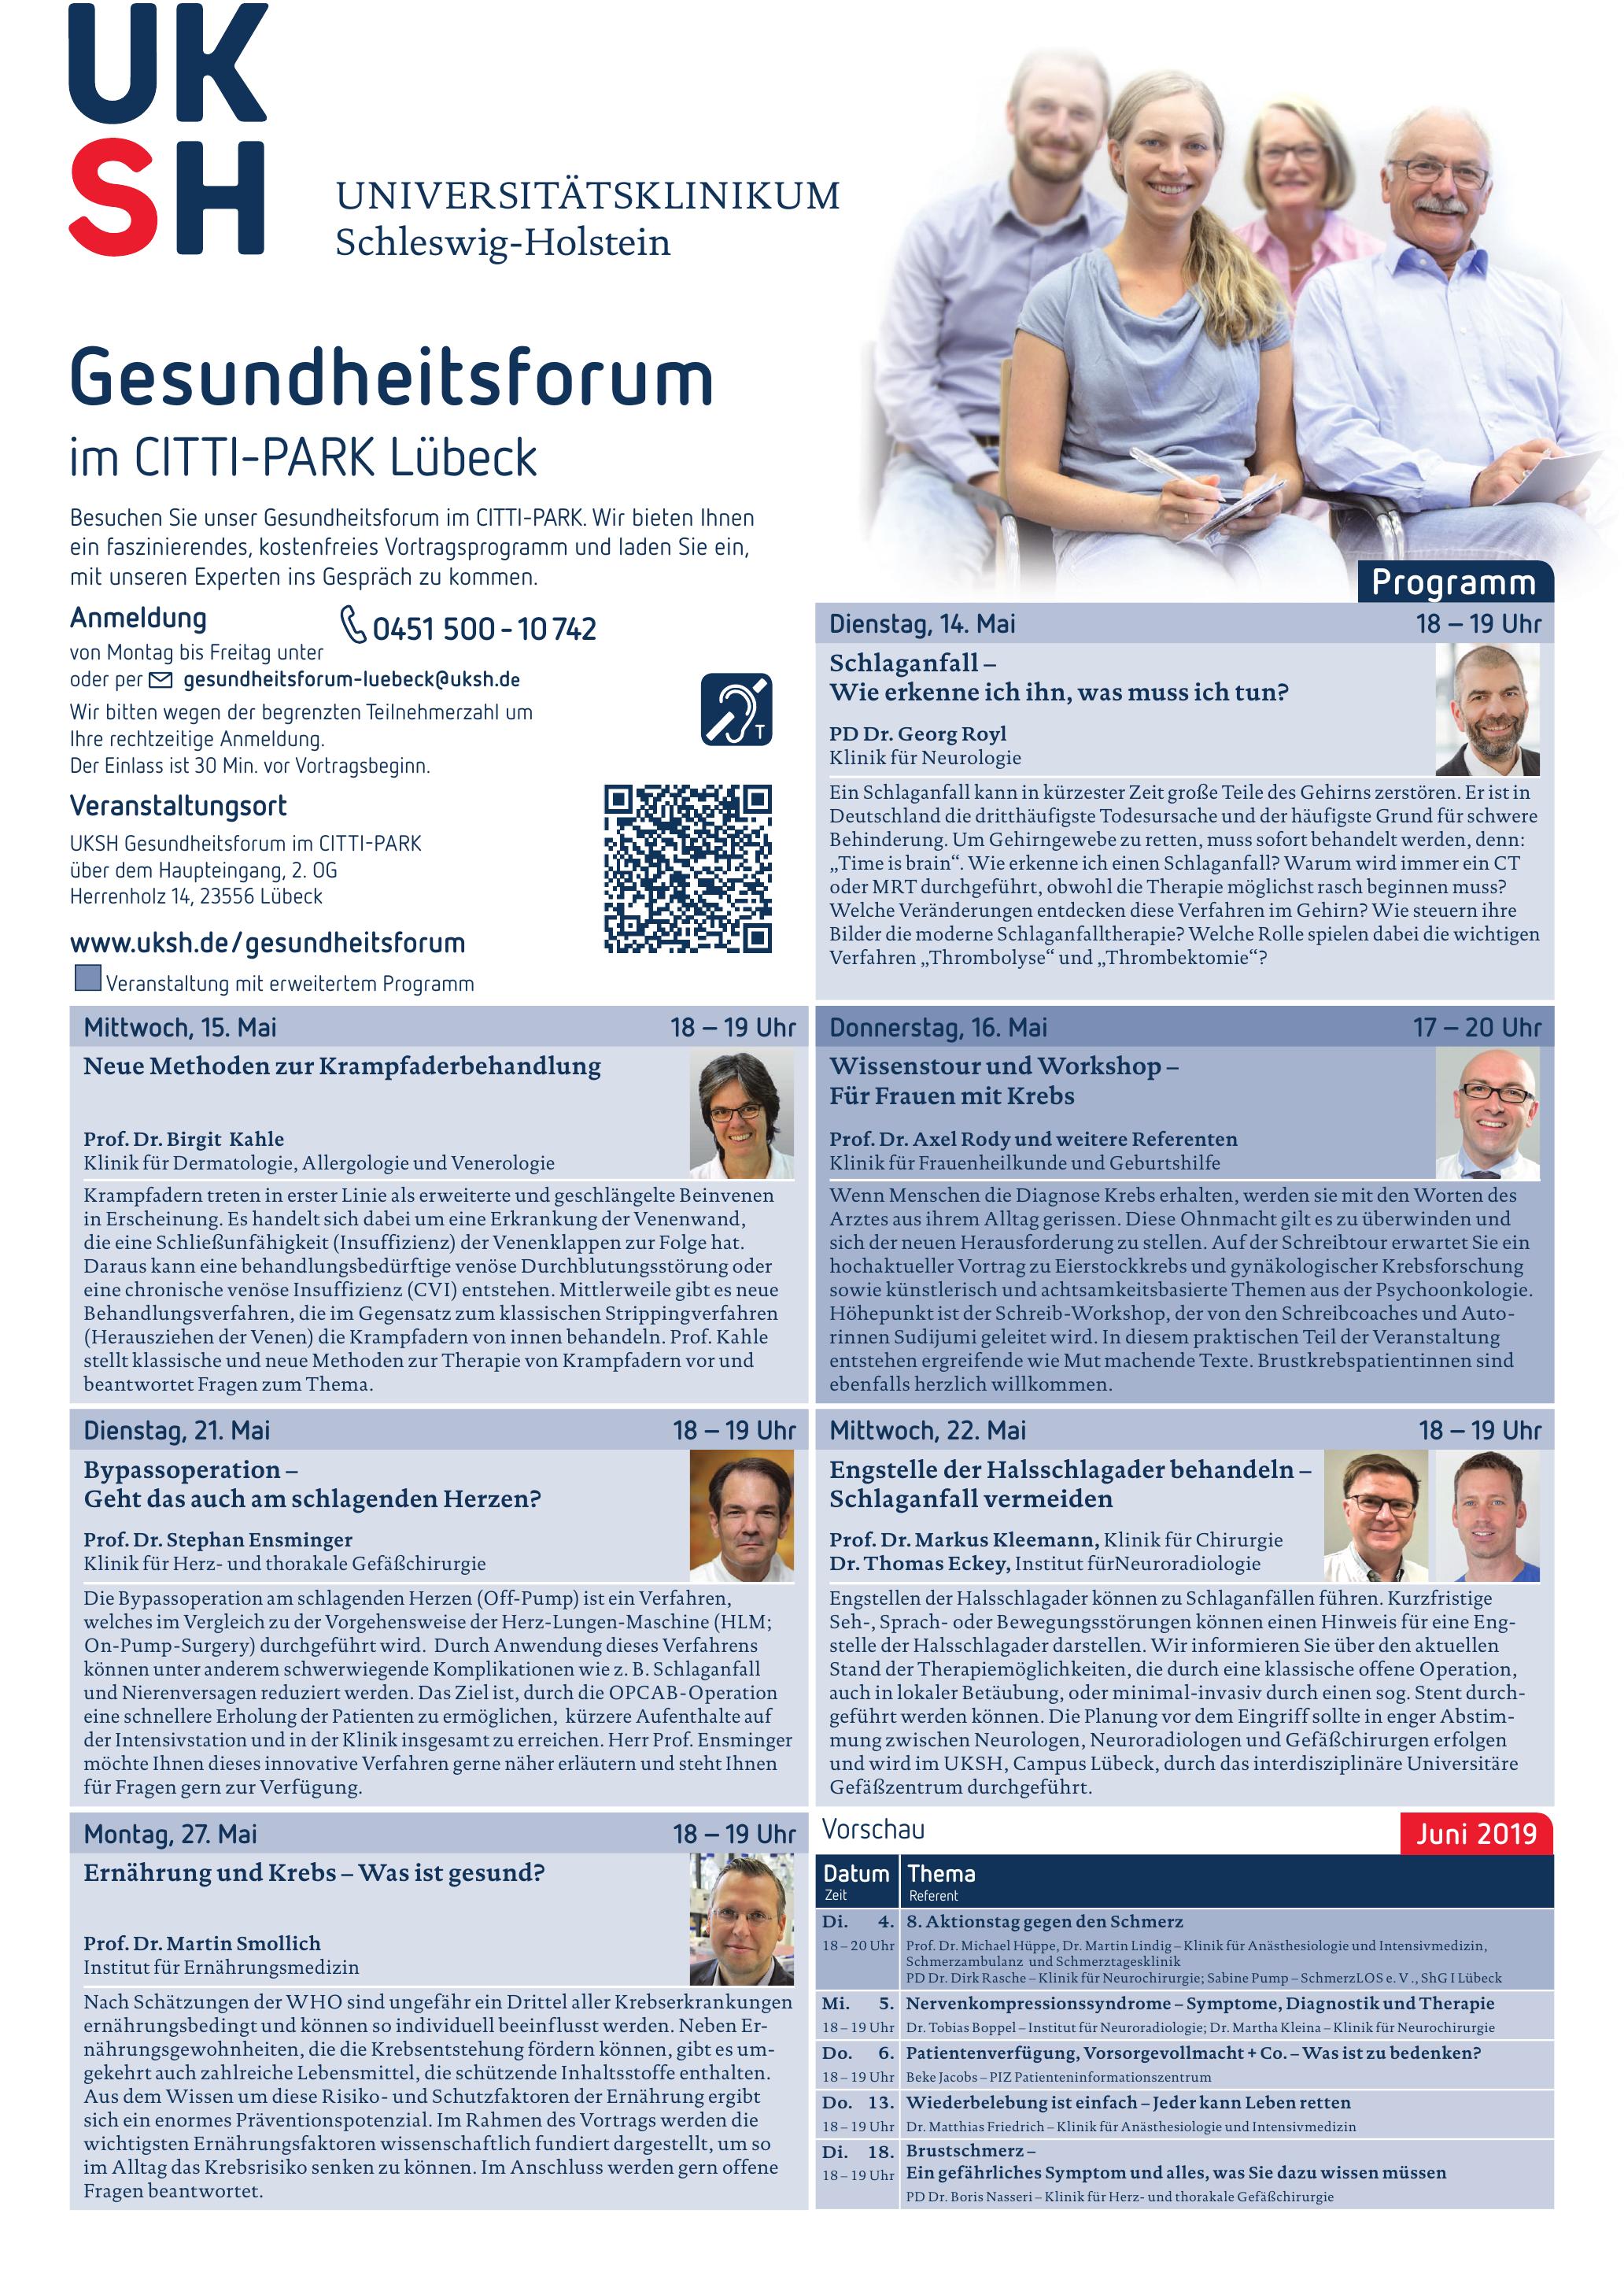 UKSH – Universitätsklinikum Schleswig-Holstein